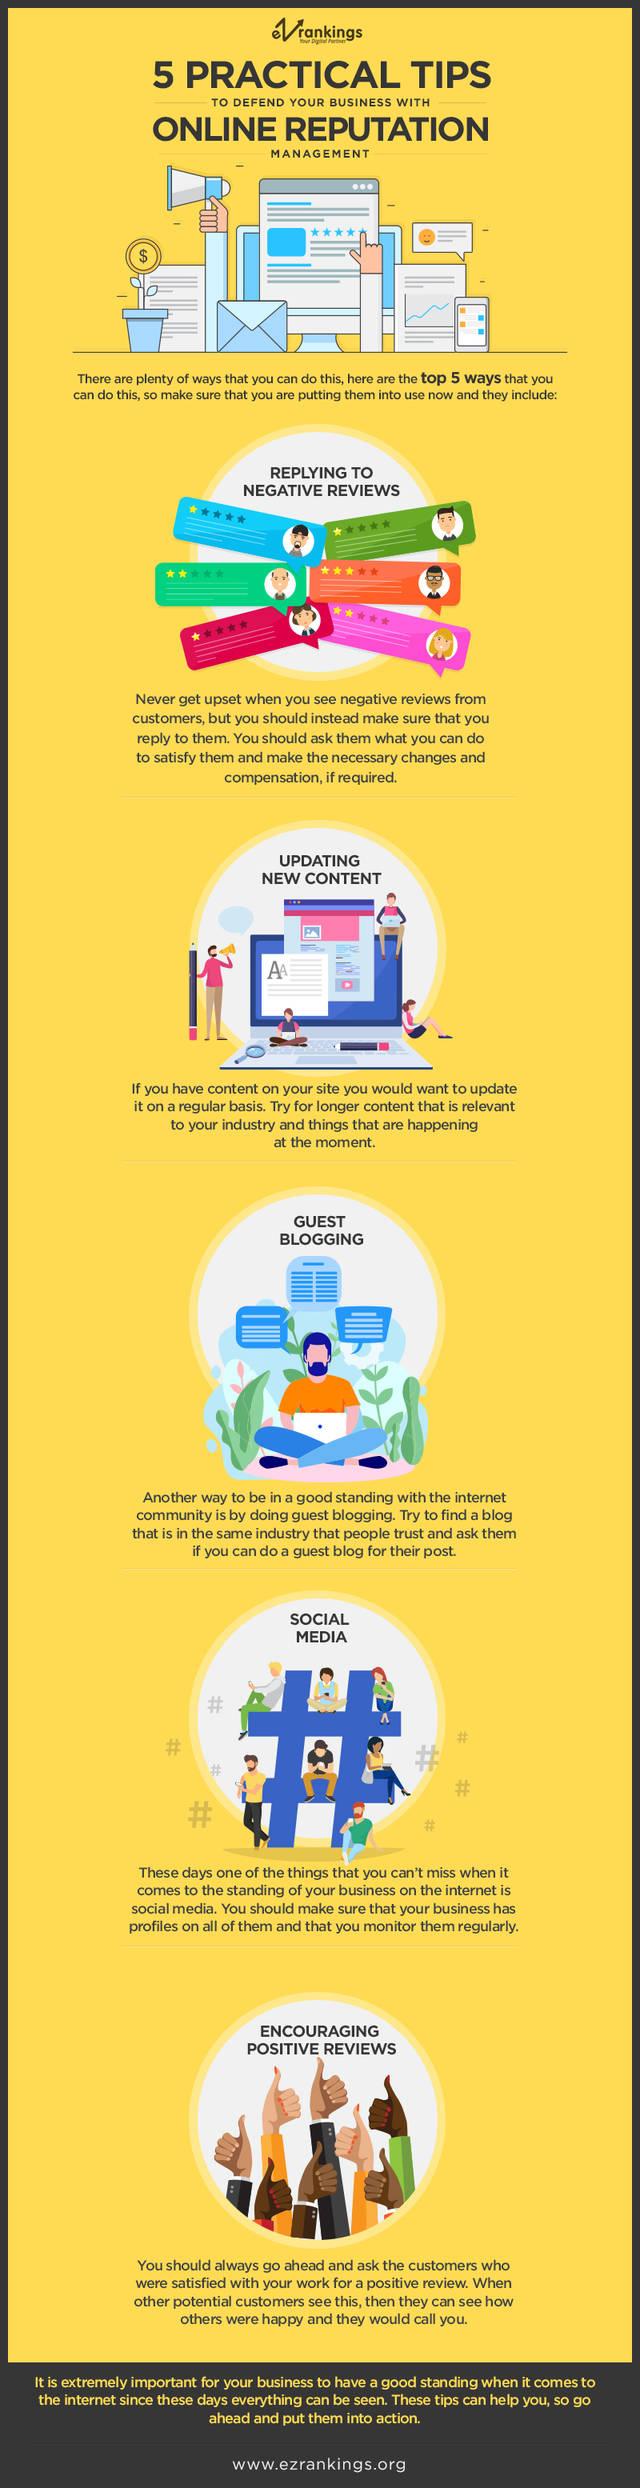 Online reputation management companies